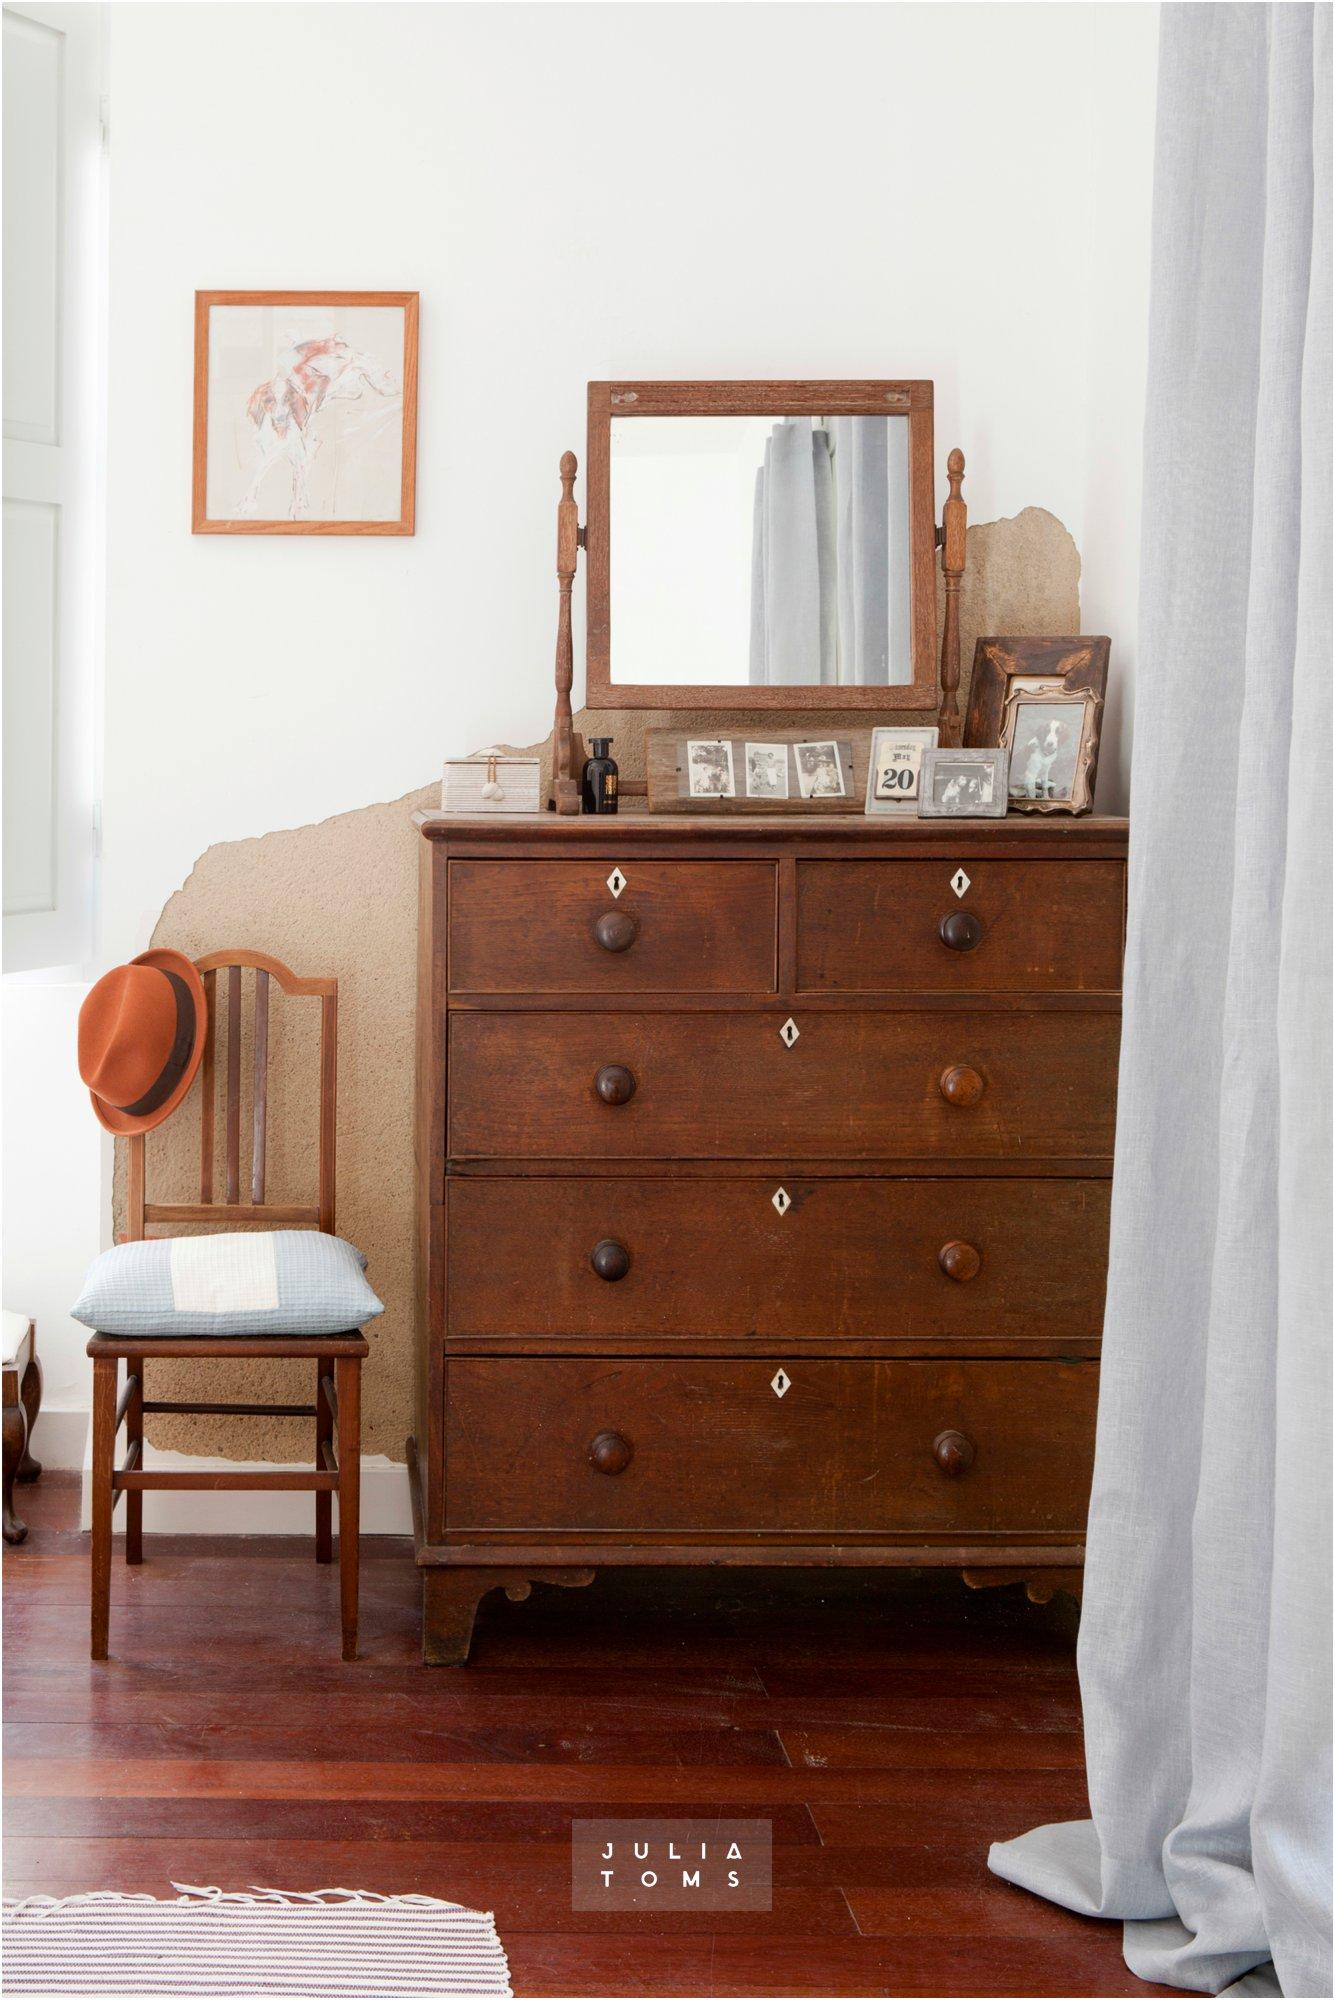 julia_toms_photography_interiors_magazine_010.jpg